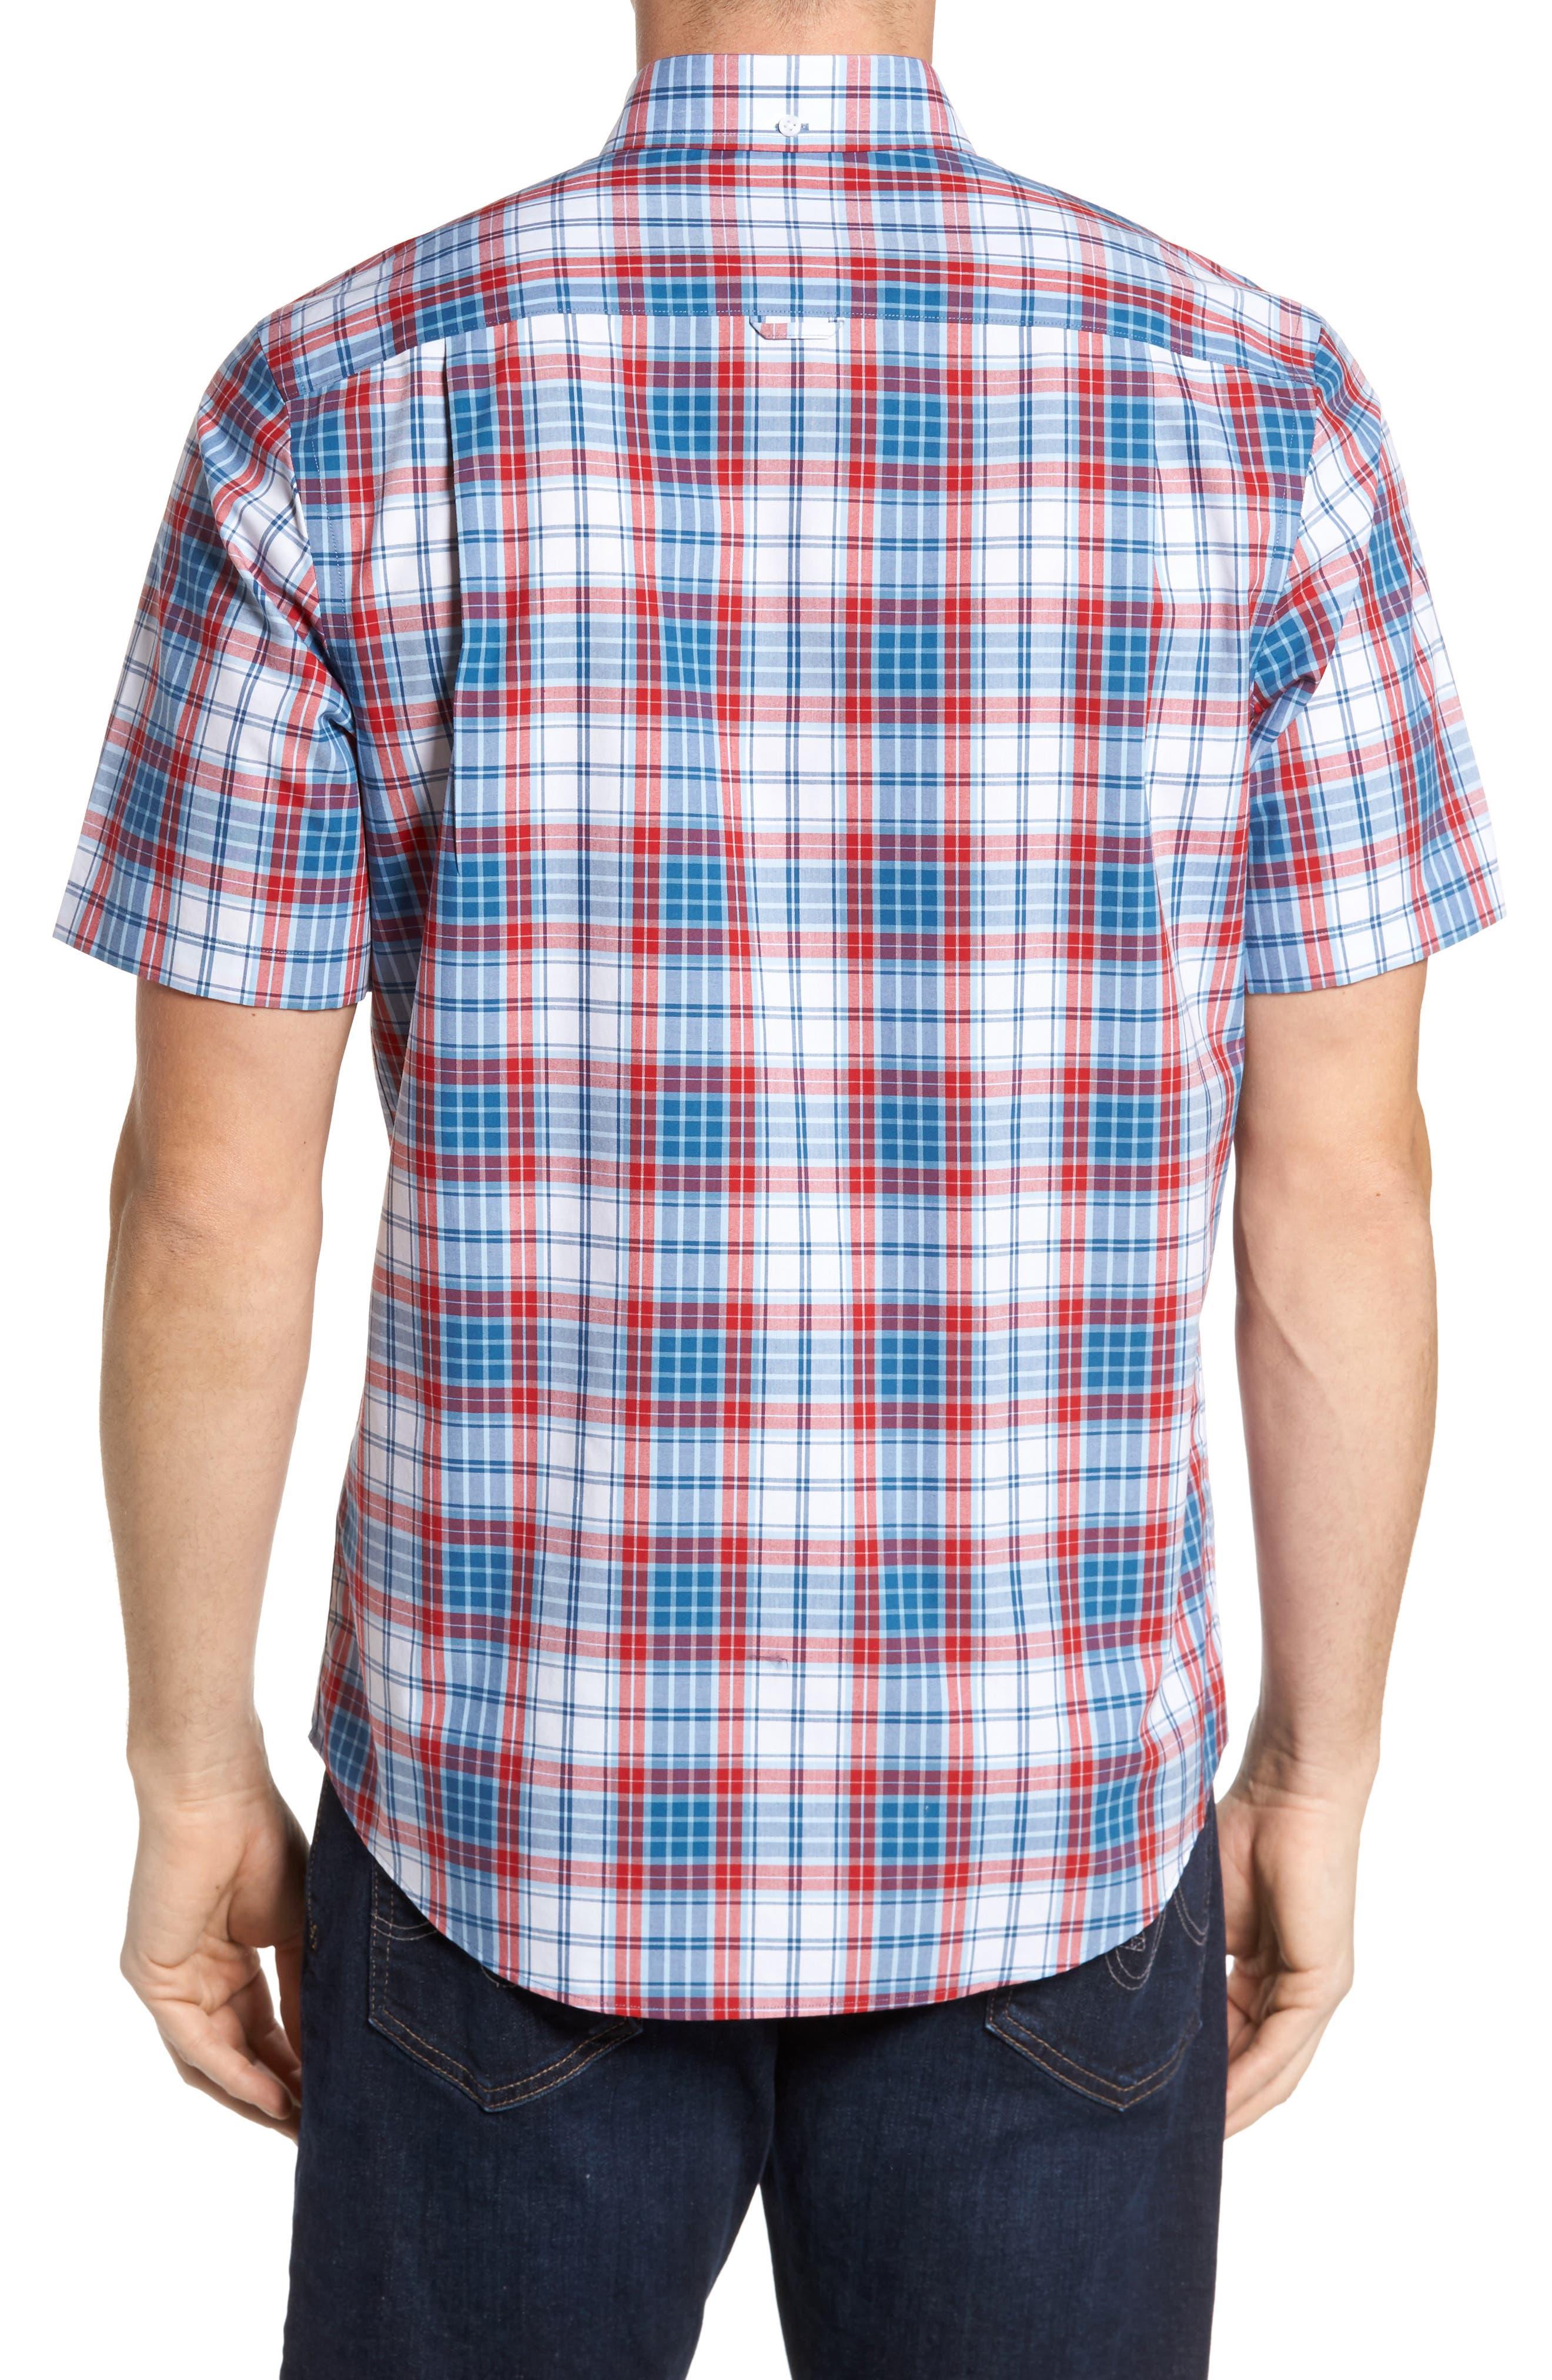 Smartcare<sup>™</sup> Regular Fit Plaid Sport Shirt,                             Alternate thumbnail 2, color,                             White Red Heather Tartan